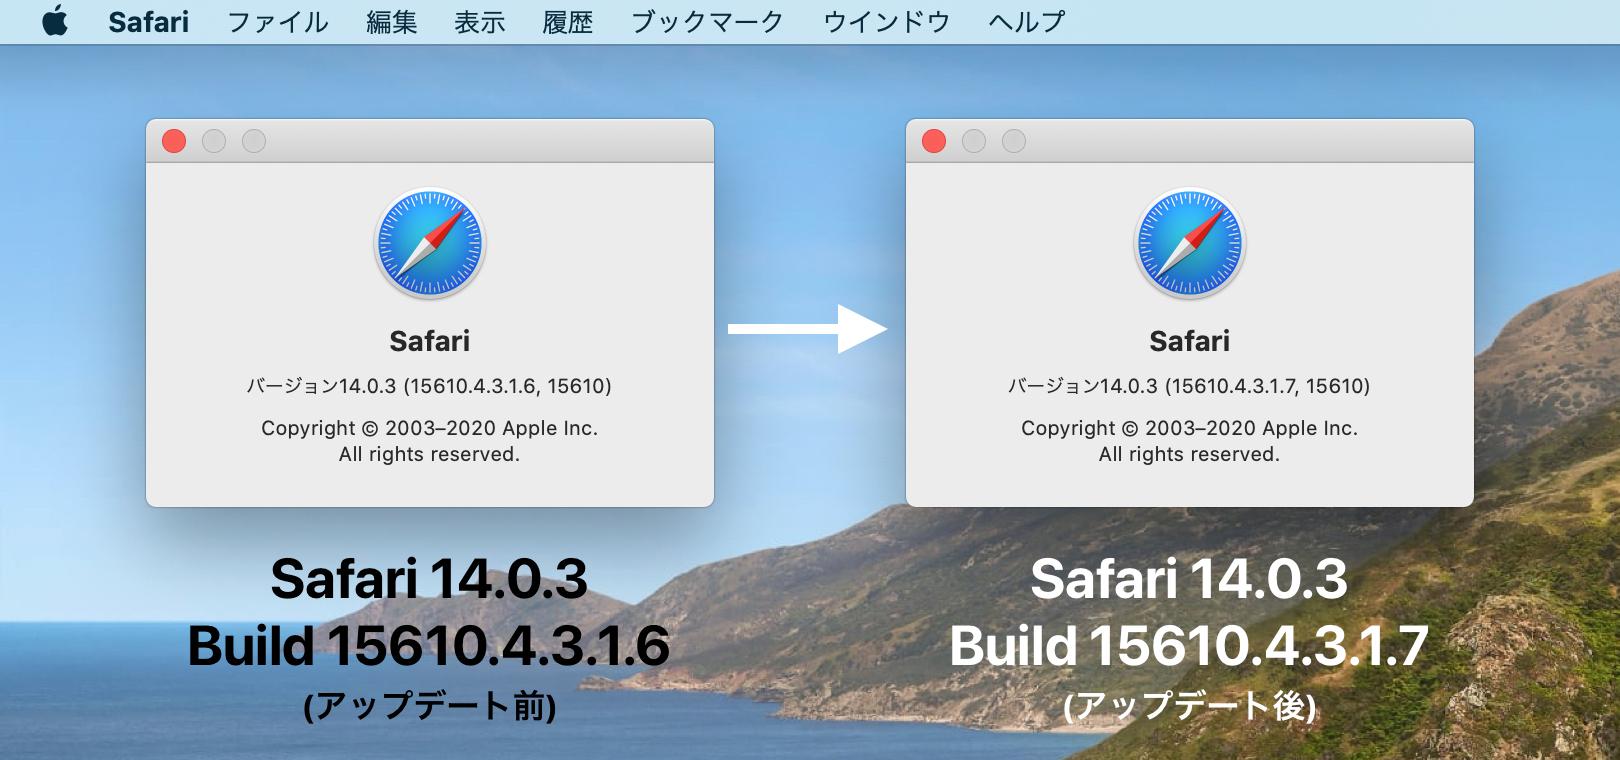 CatalinaのSafari 14.0.3ではBuild 15610.4.3.1.7